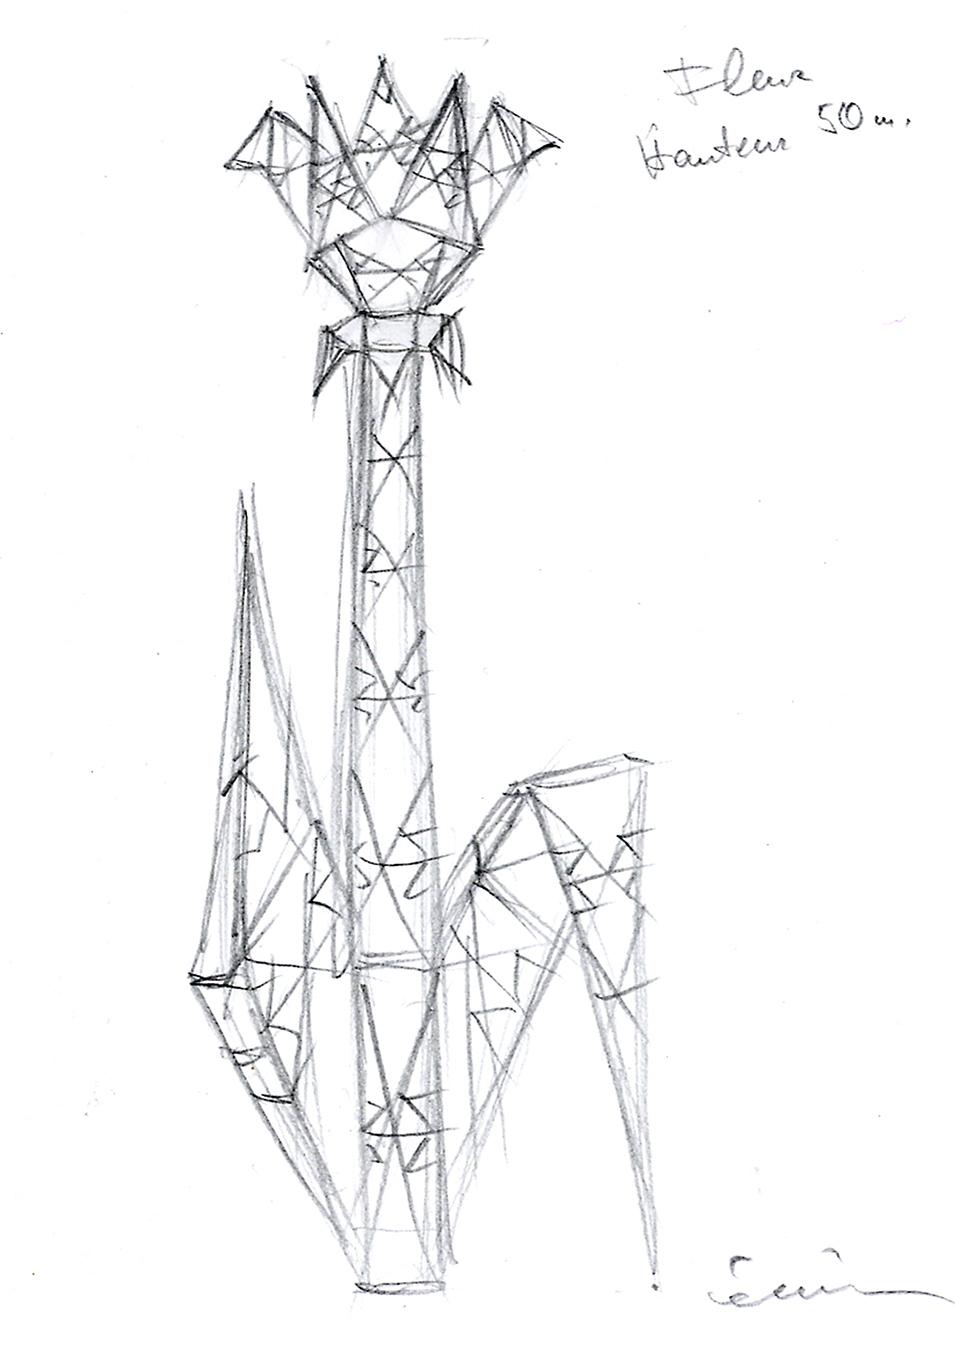 Flower, pylon